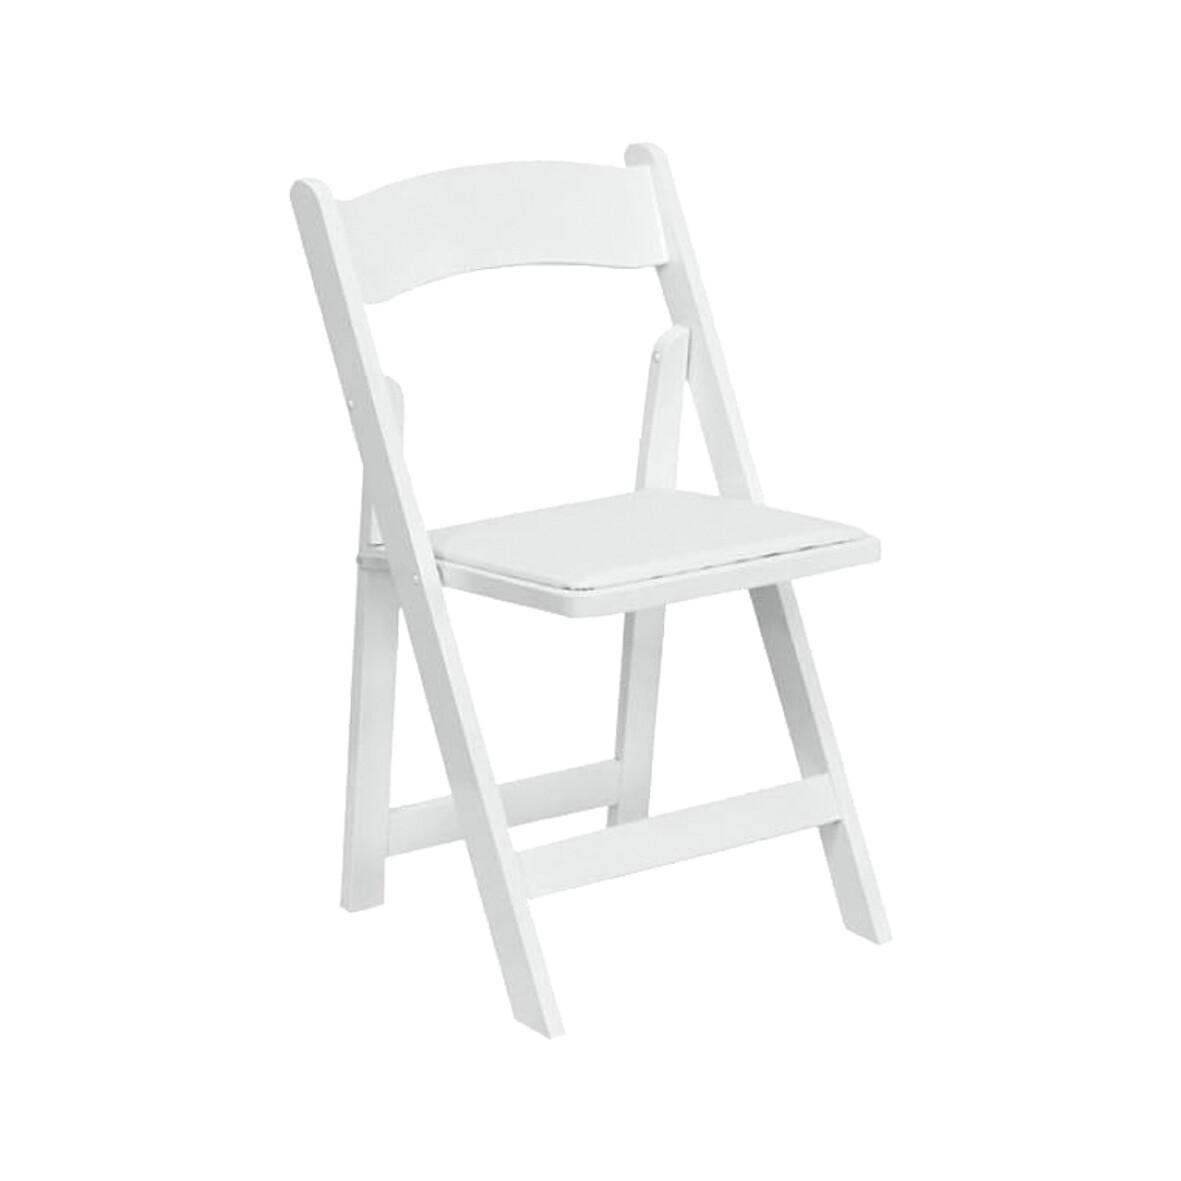 Wimbledon Chair White